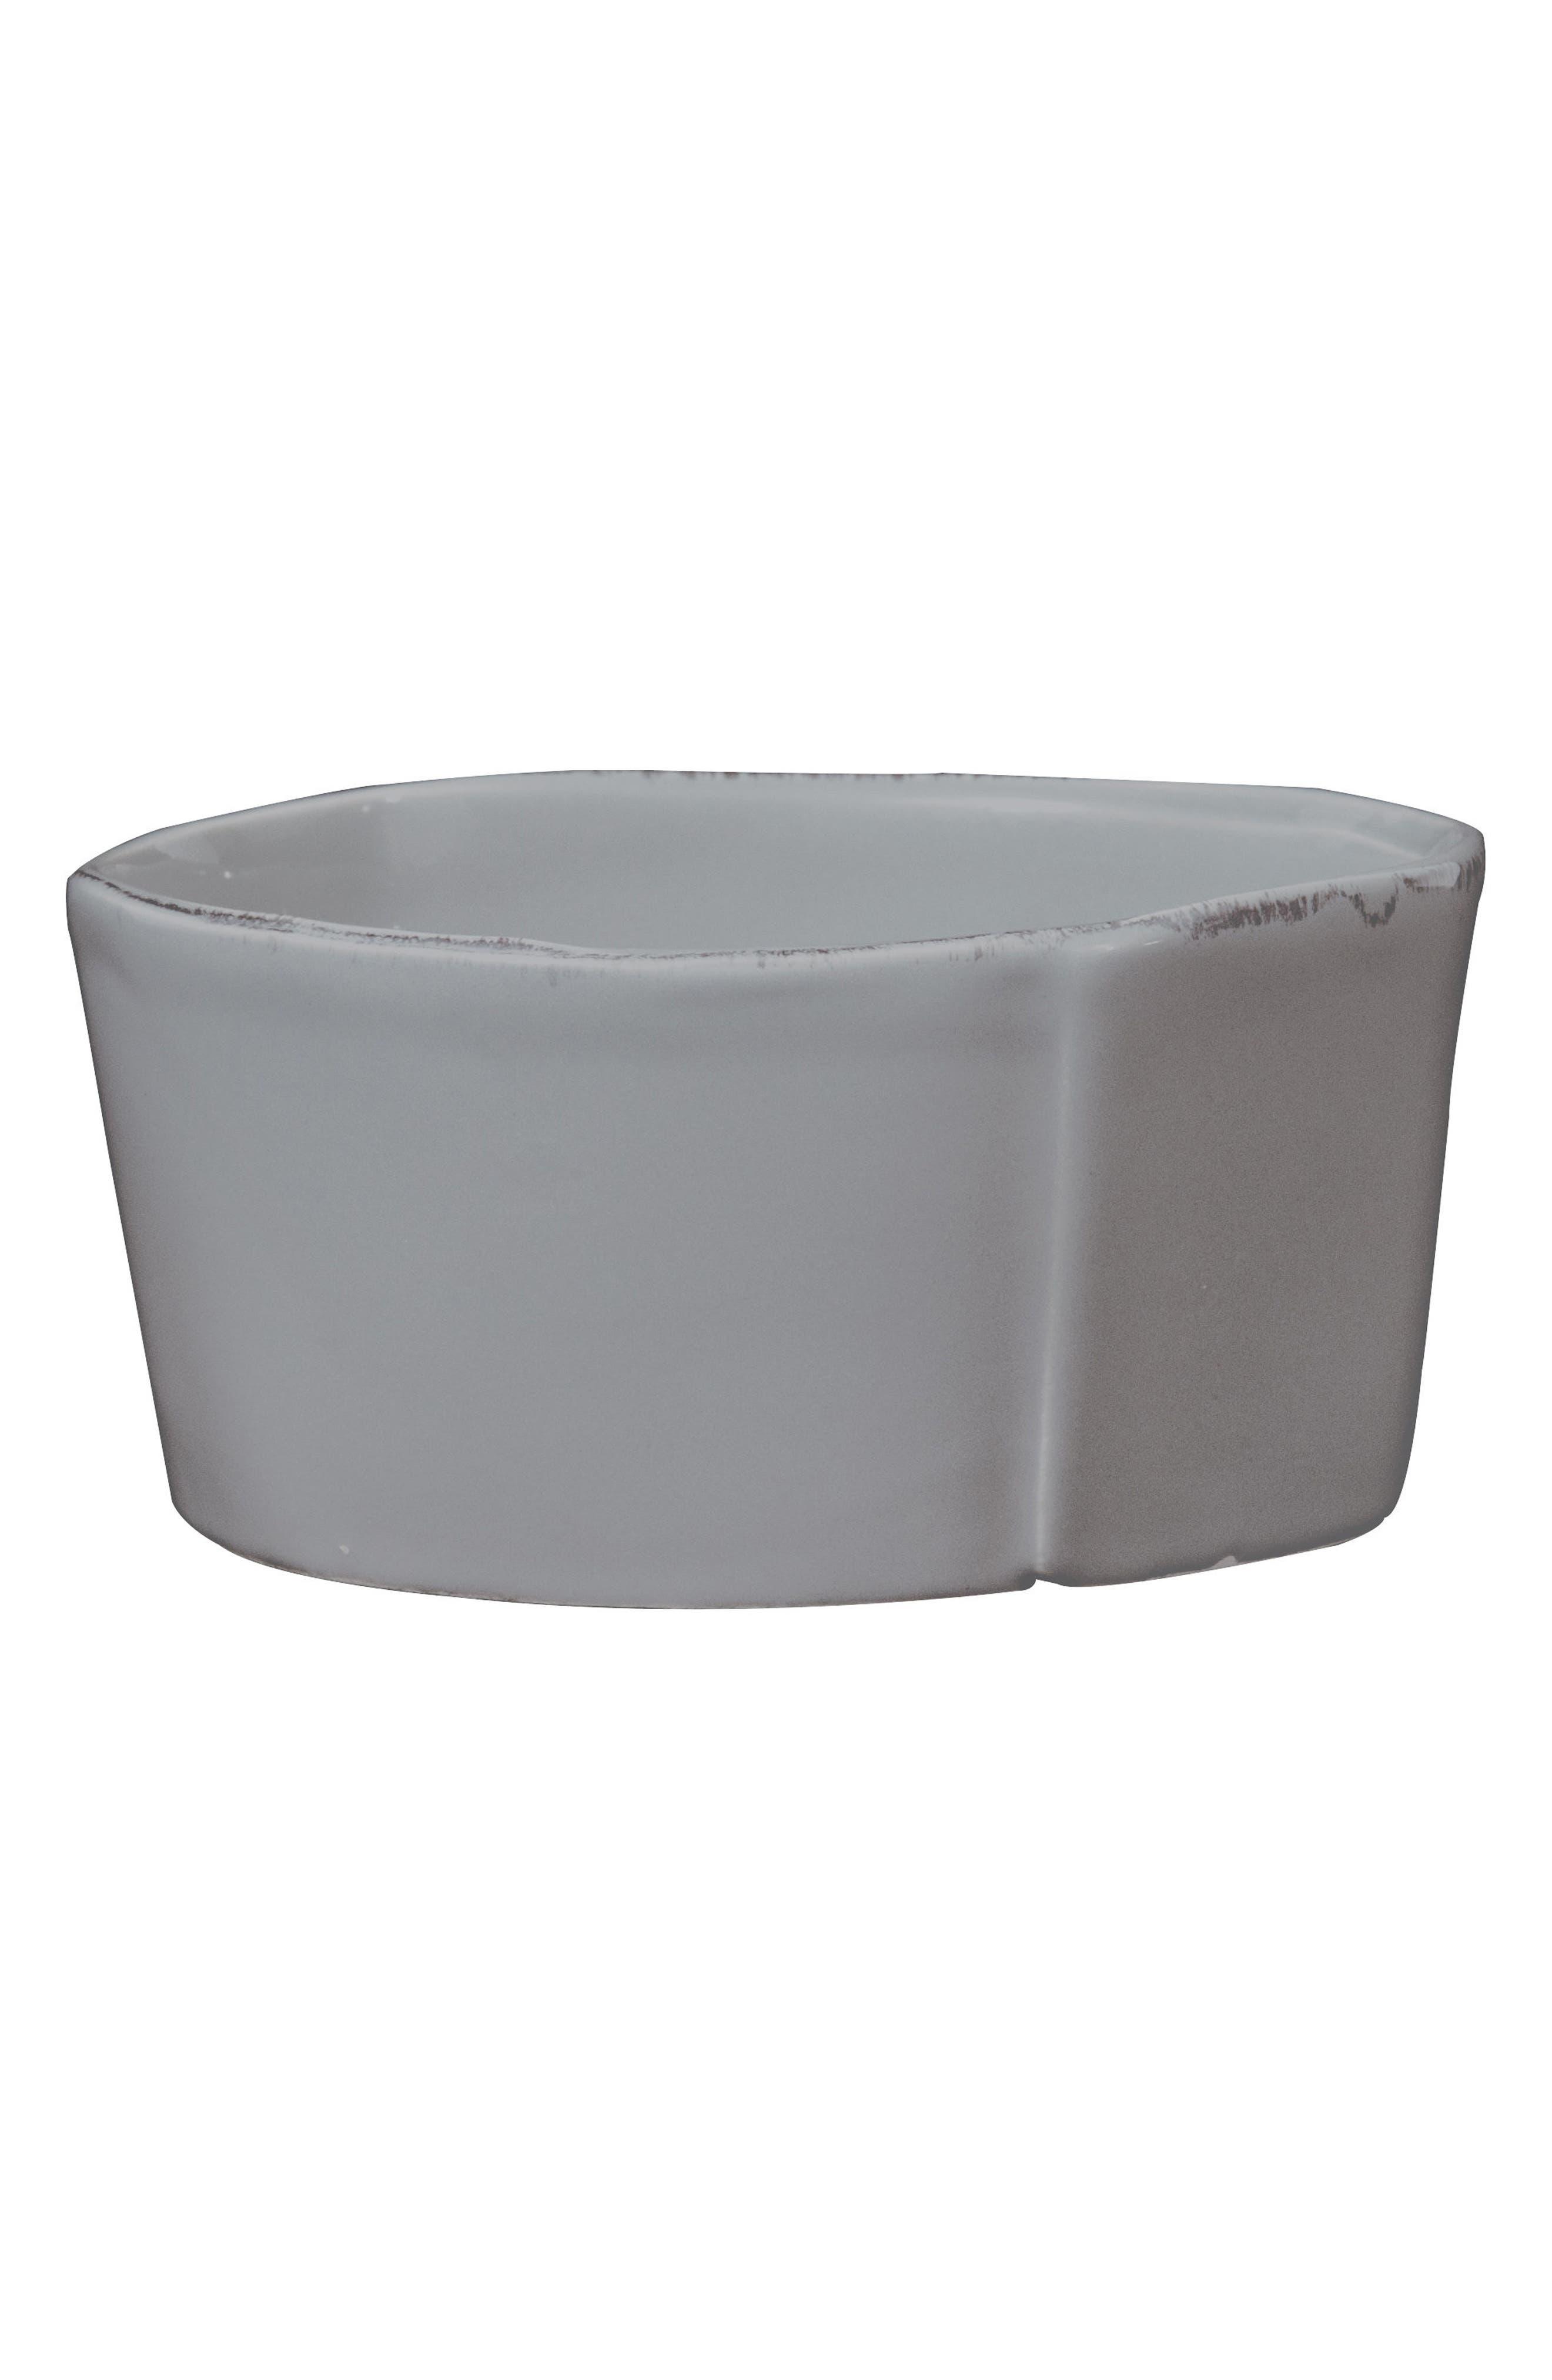 Lastra Serving Bowl,                         Main,                         color, GRAY - MEDIUM